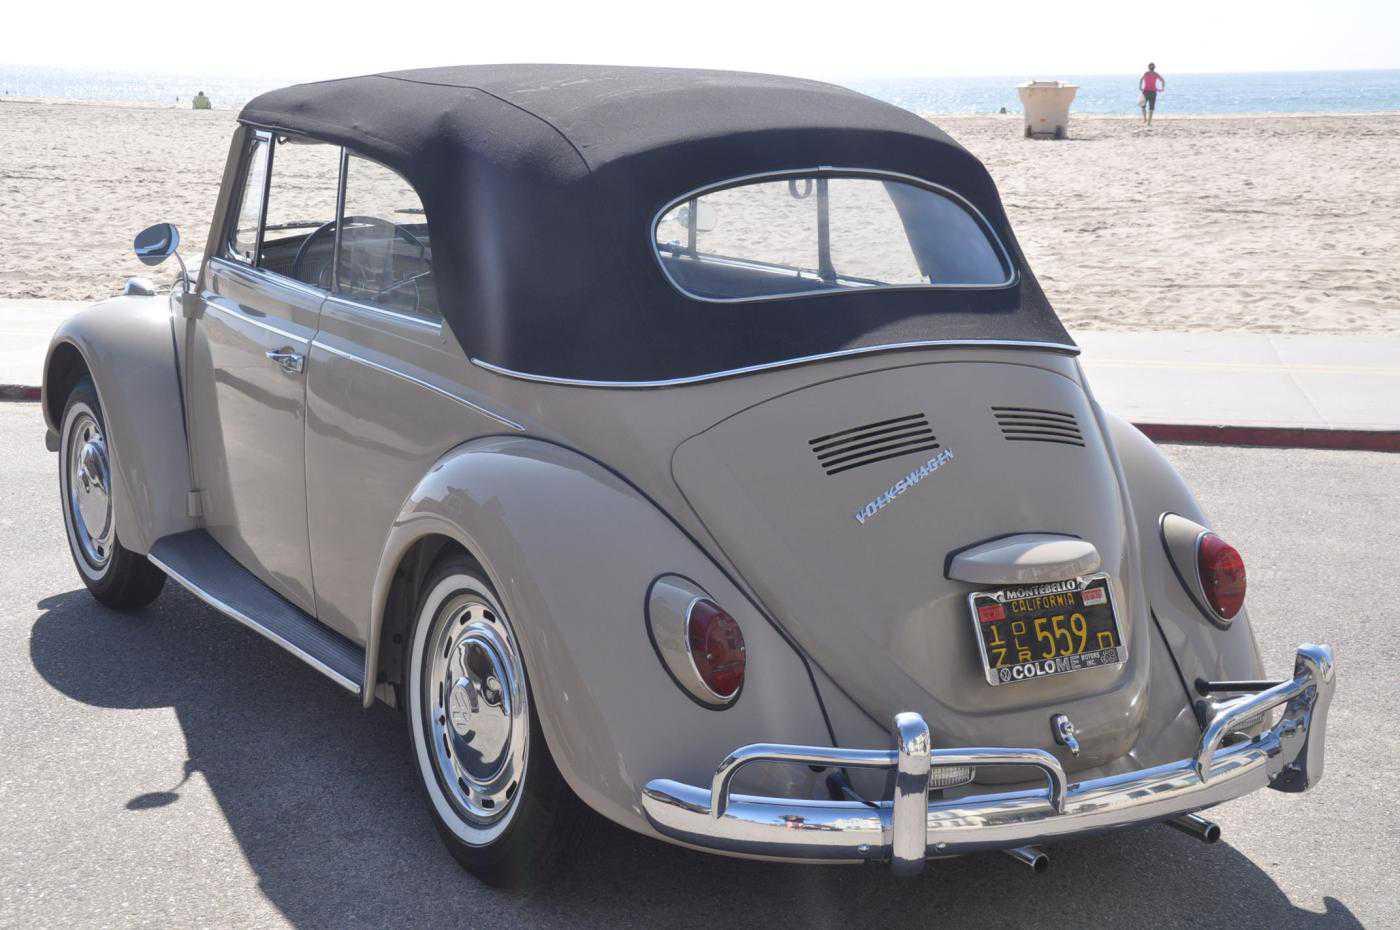 1967 vw beetle convertible buy classic volks. Black Bedroom Furniture Sets. Home Design Ideas